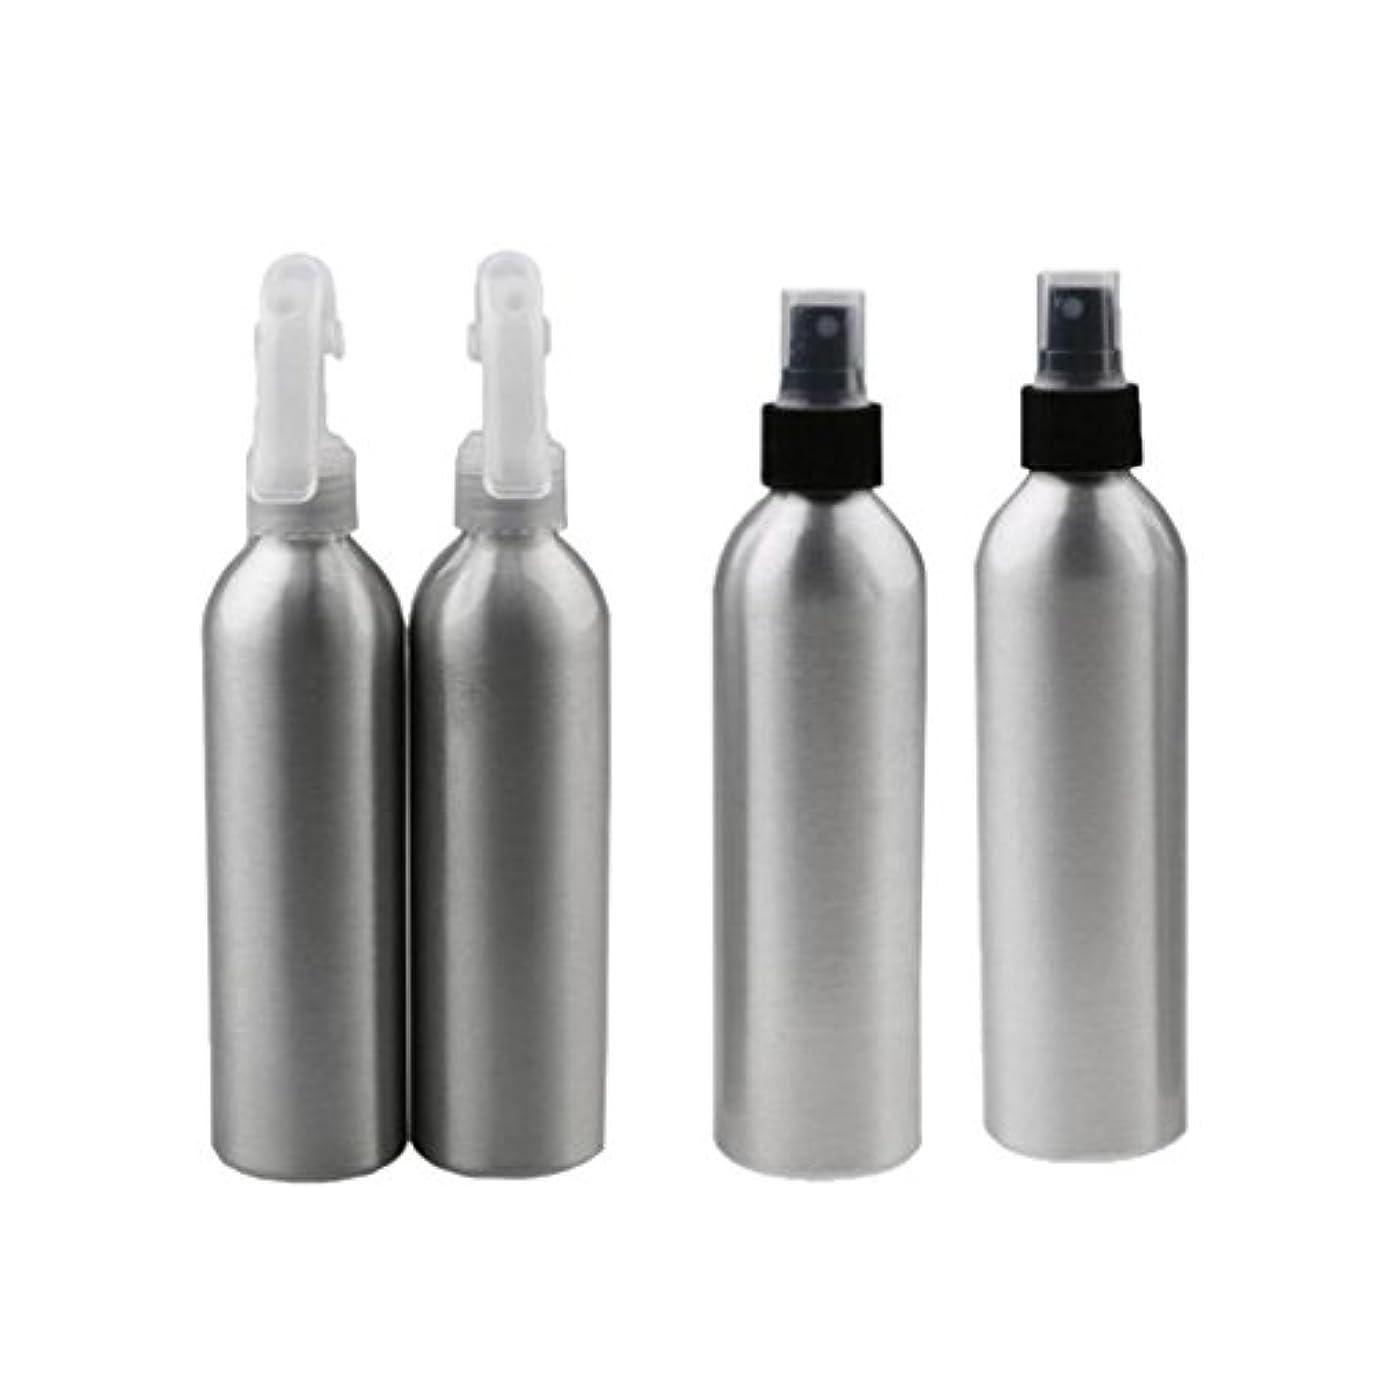 Baosity 4個 2x100ml 2x50ml アルミ 空 ミストスプレー ボトル メイクアップ 香水 スプレーアトマイザー 便利